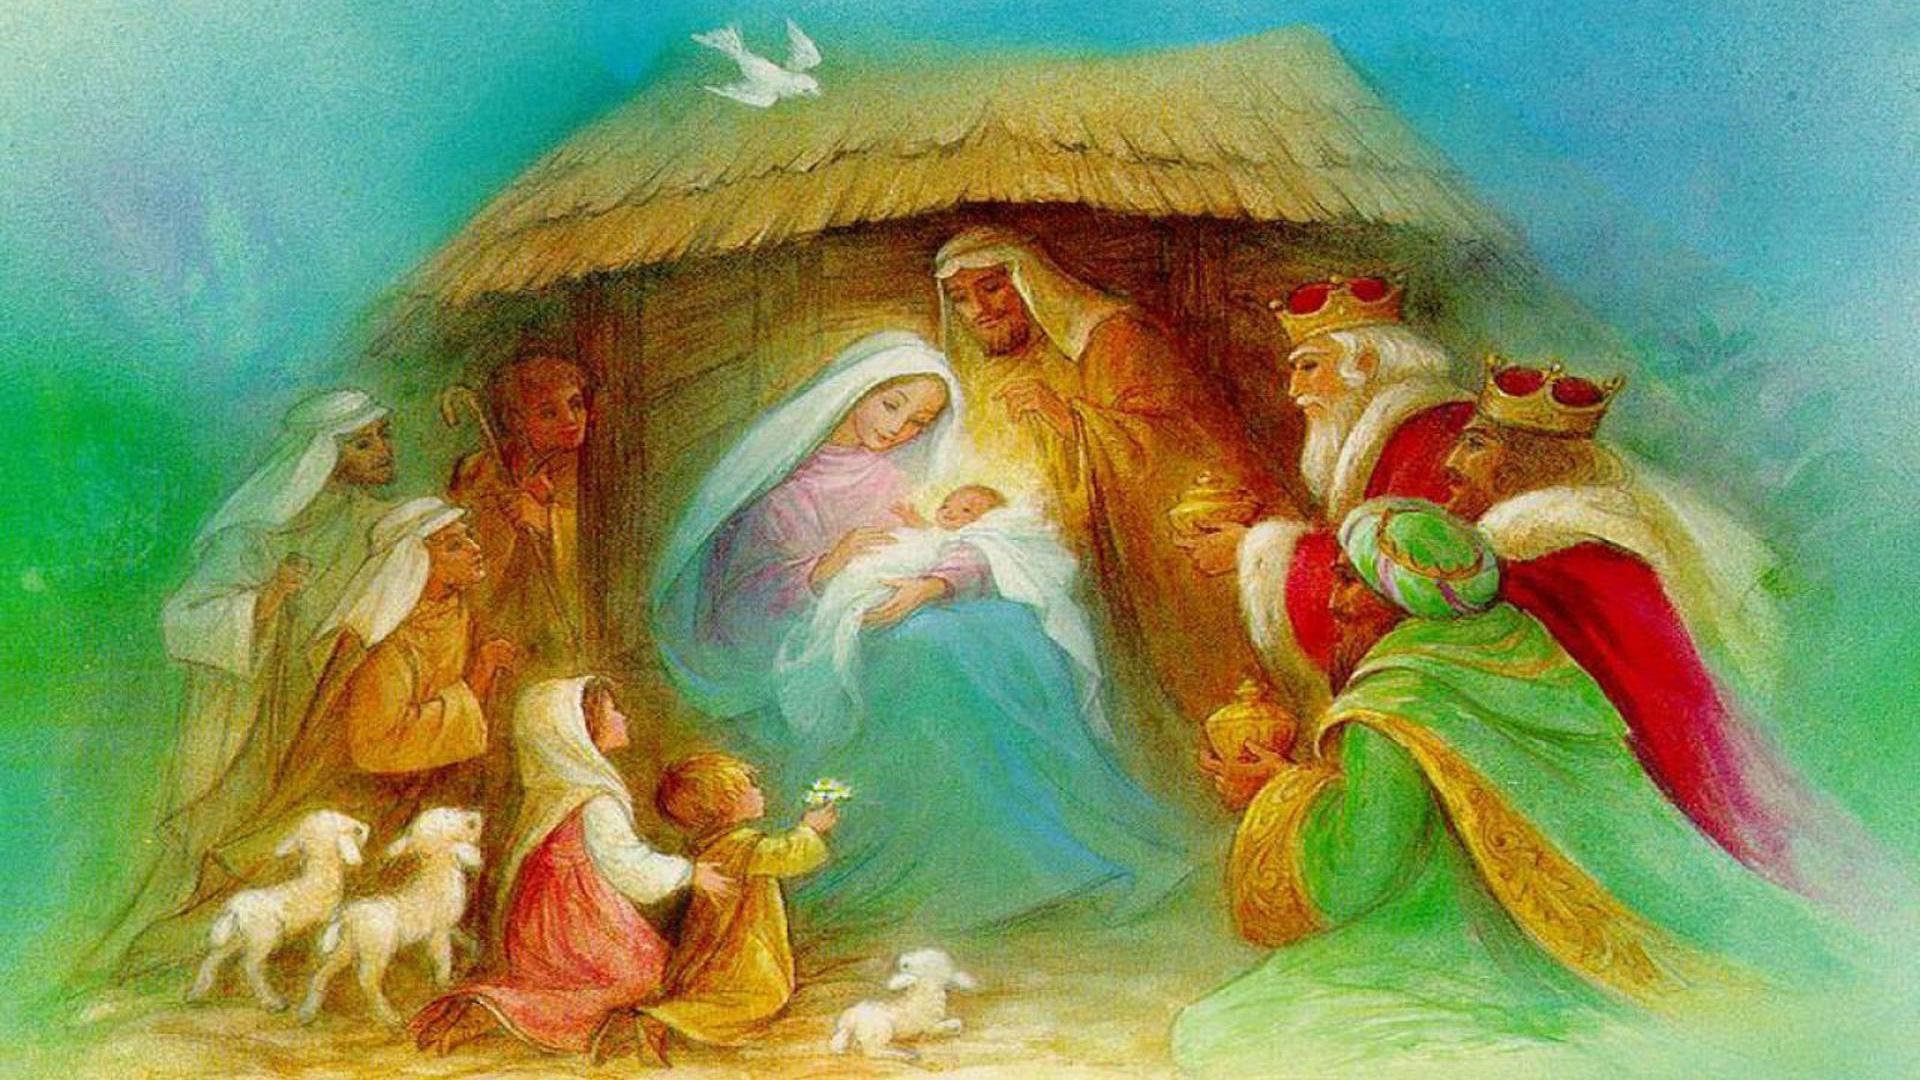 Christmas Nativity Wallpaper